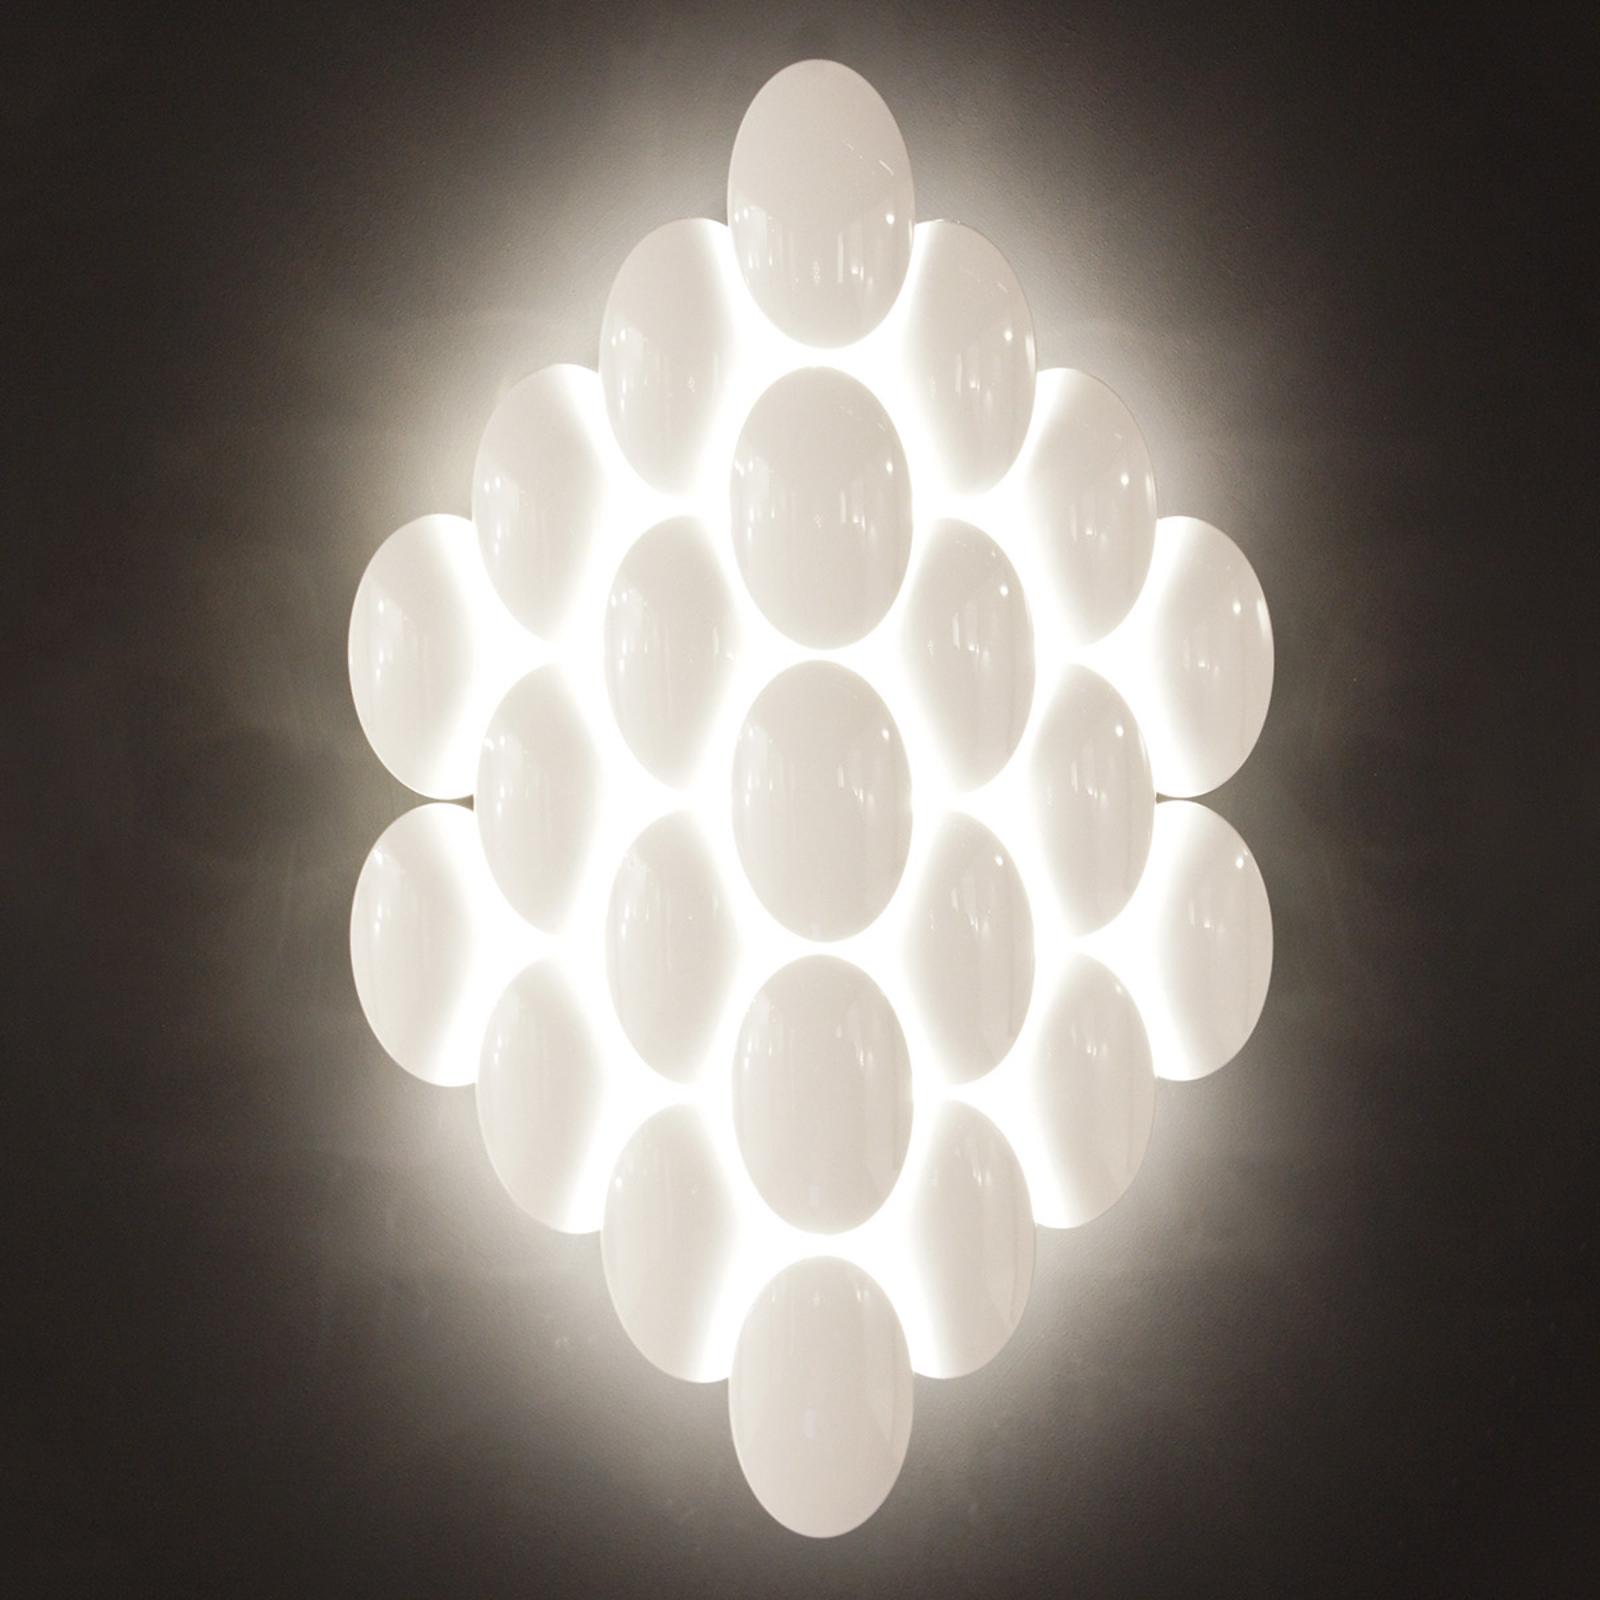 Applique a LED Obolo dimmerabile 16 luci